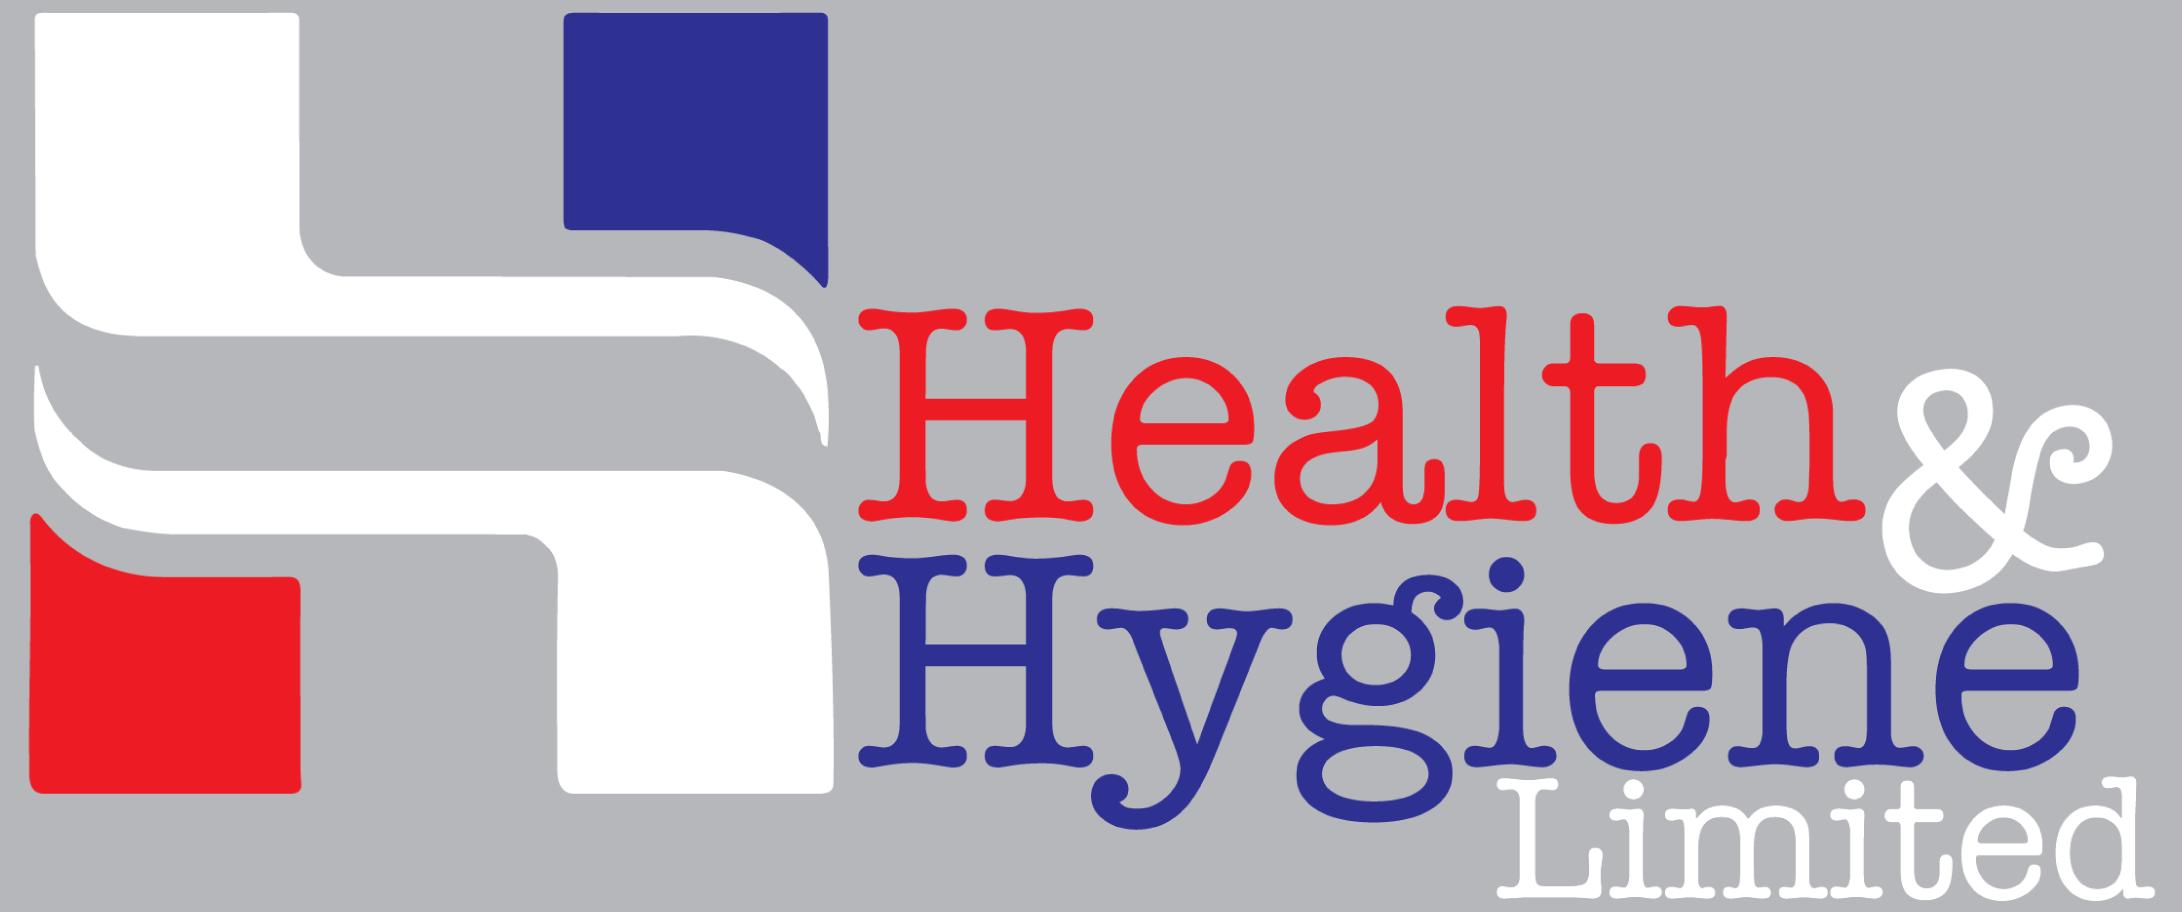 Health Hygiene 1